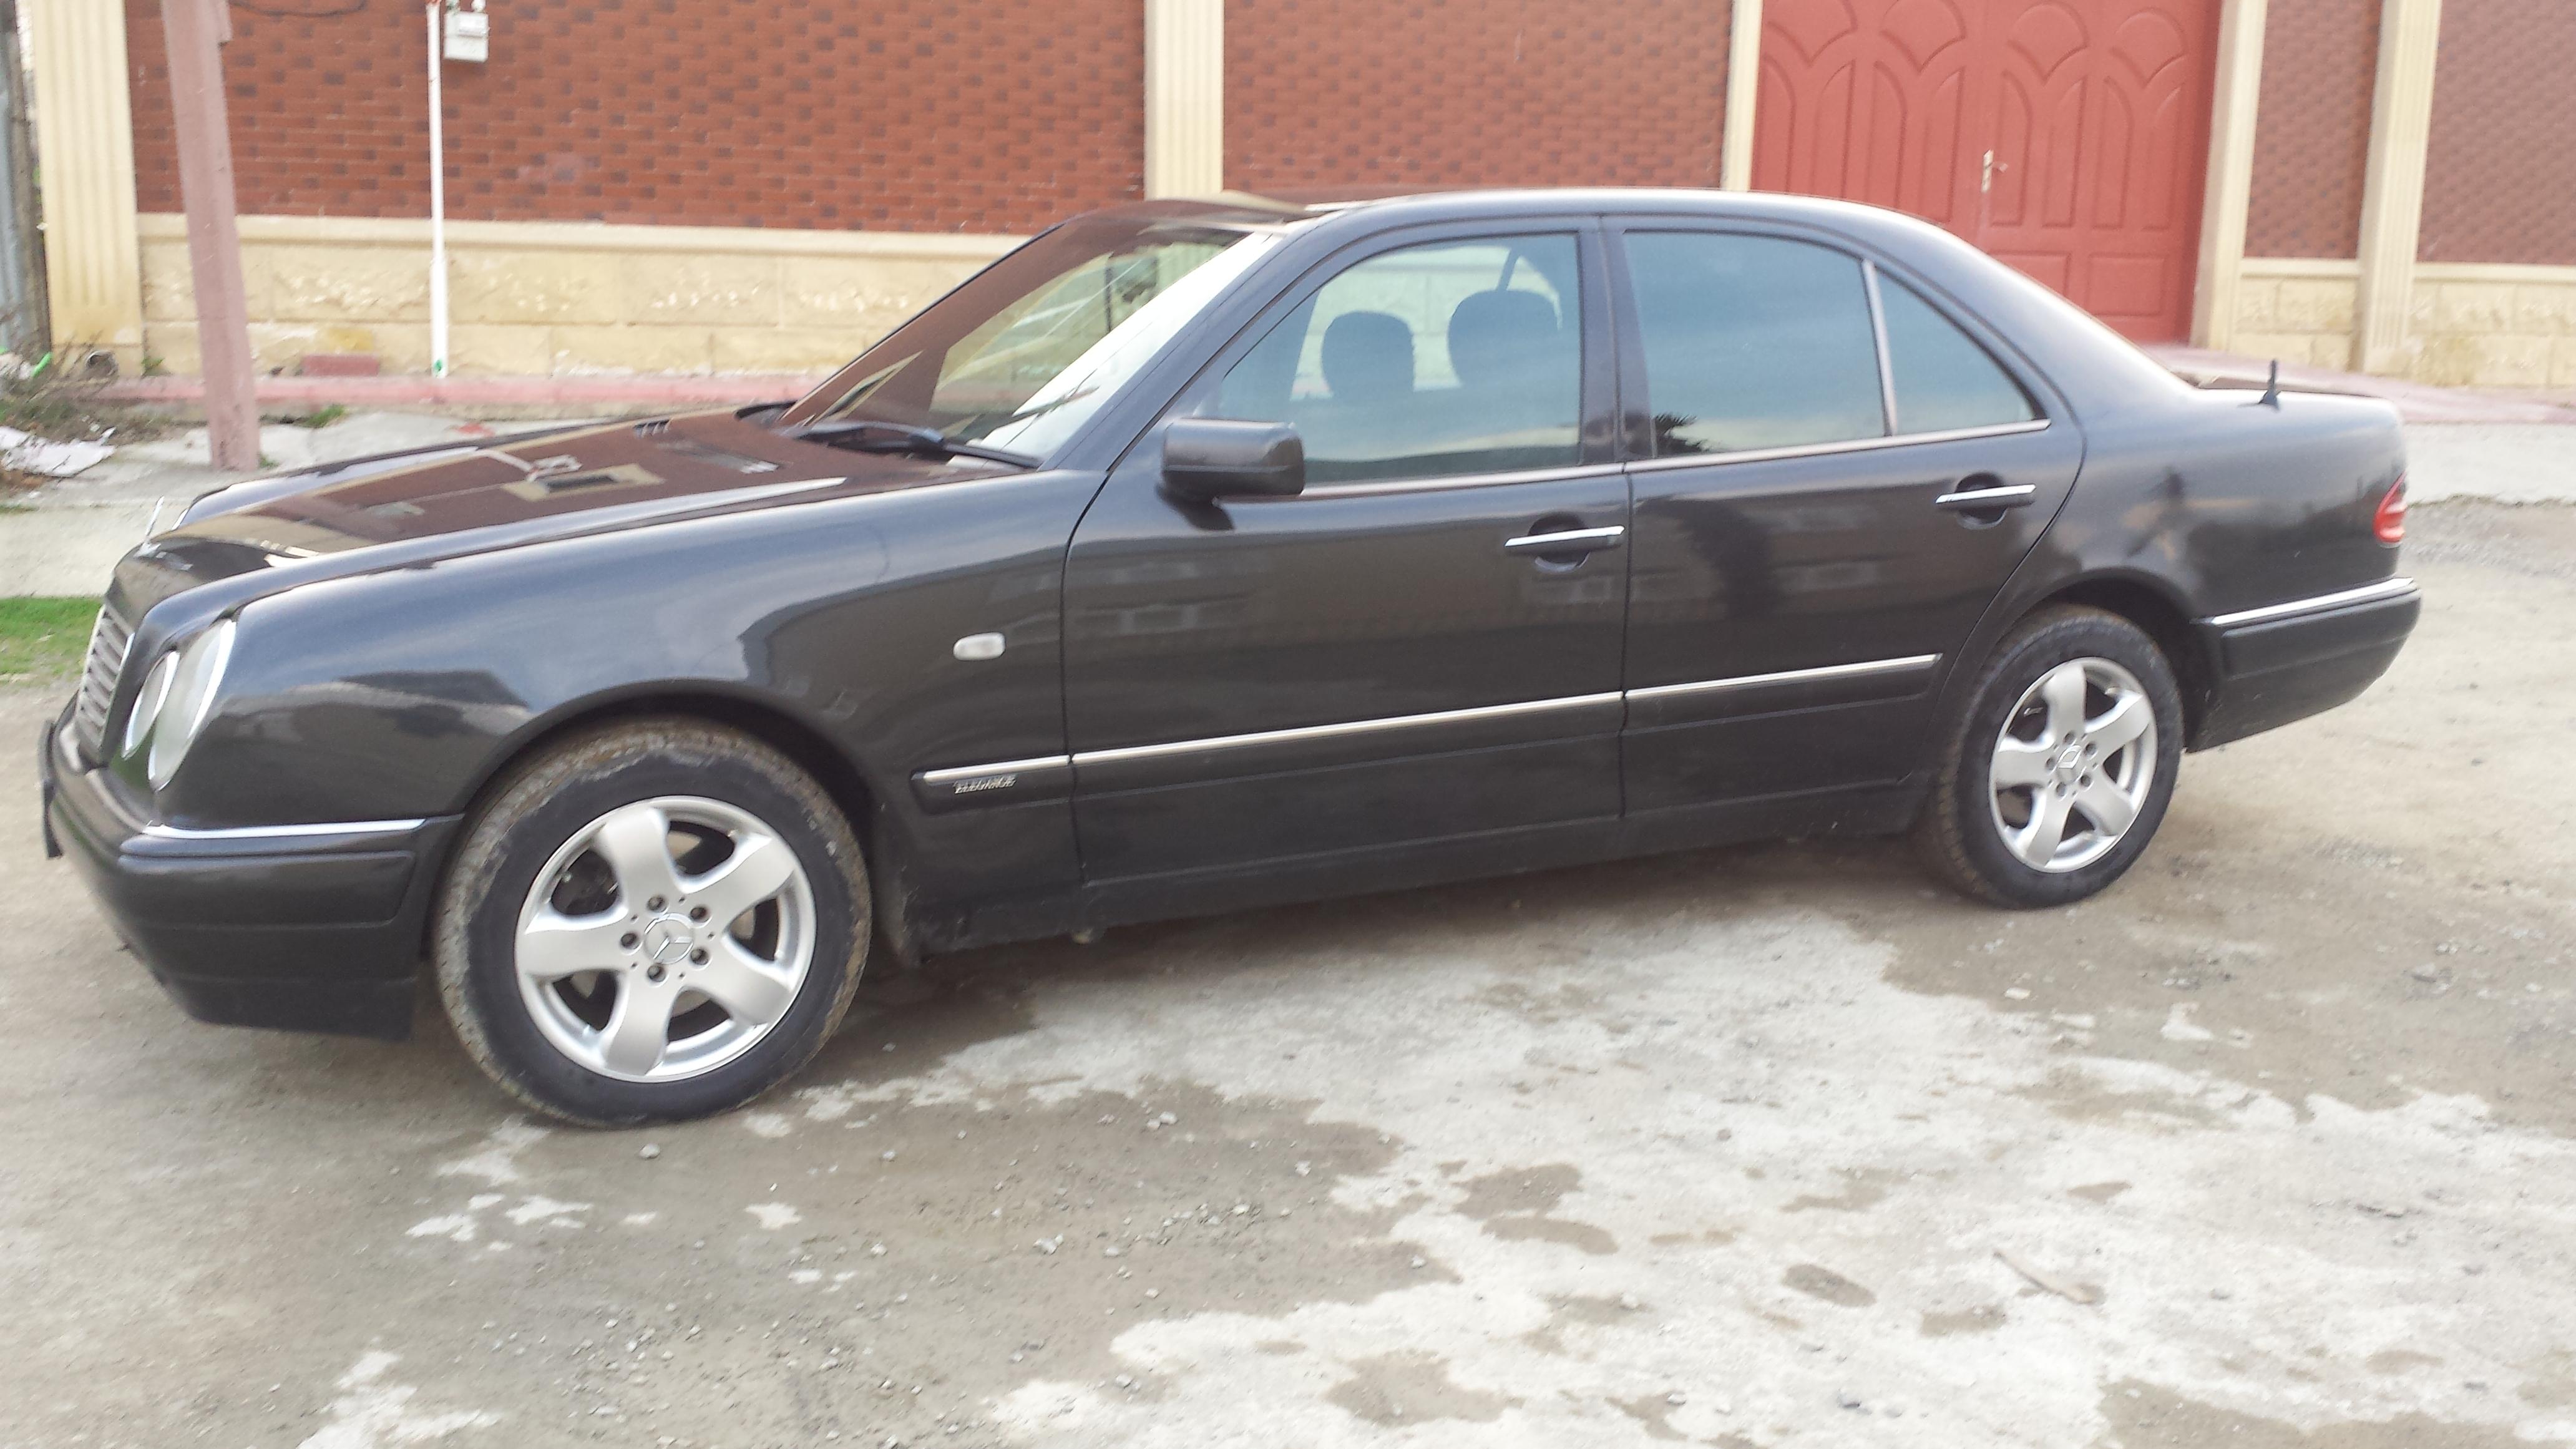 Mercedes-Benz E 280 2.8(lt) 1996 İkinci əl  $5000